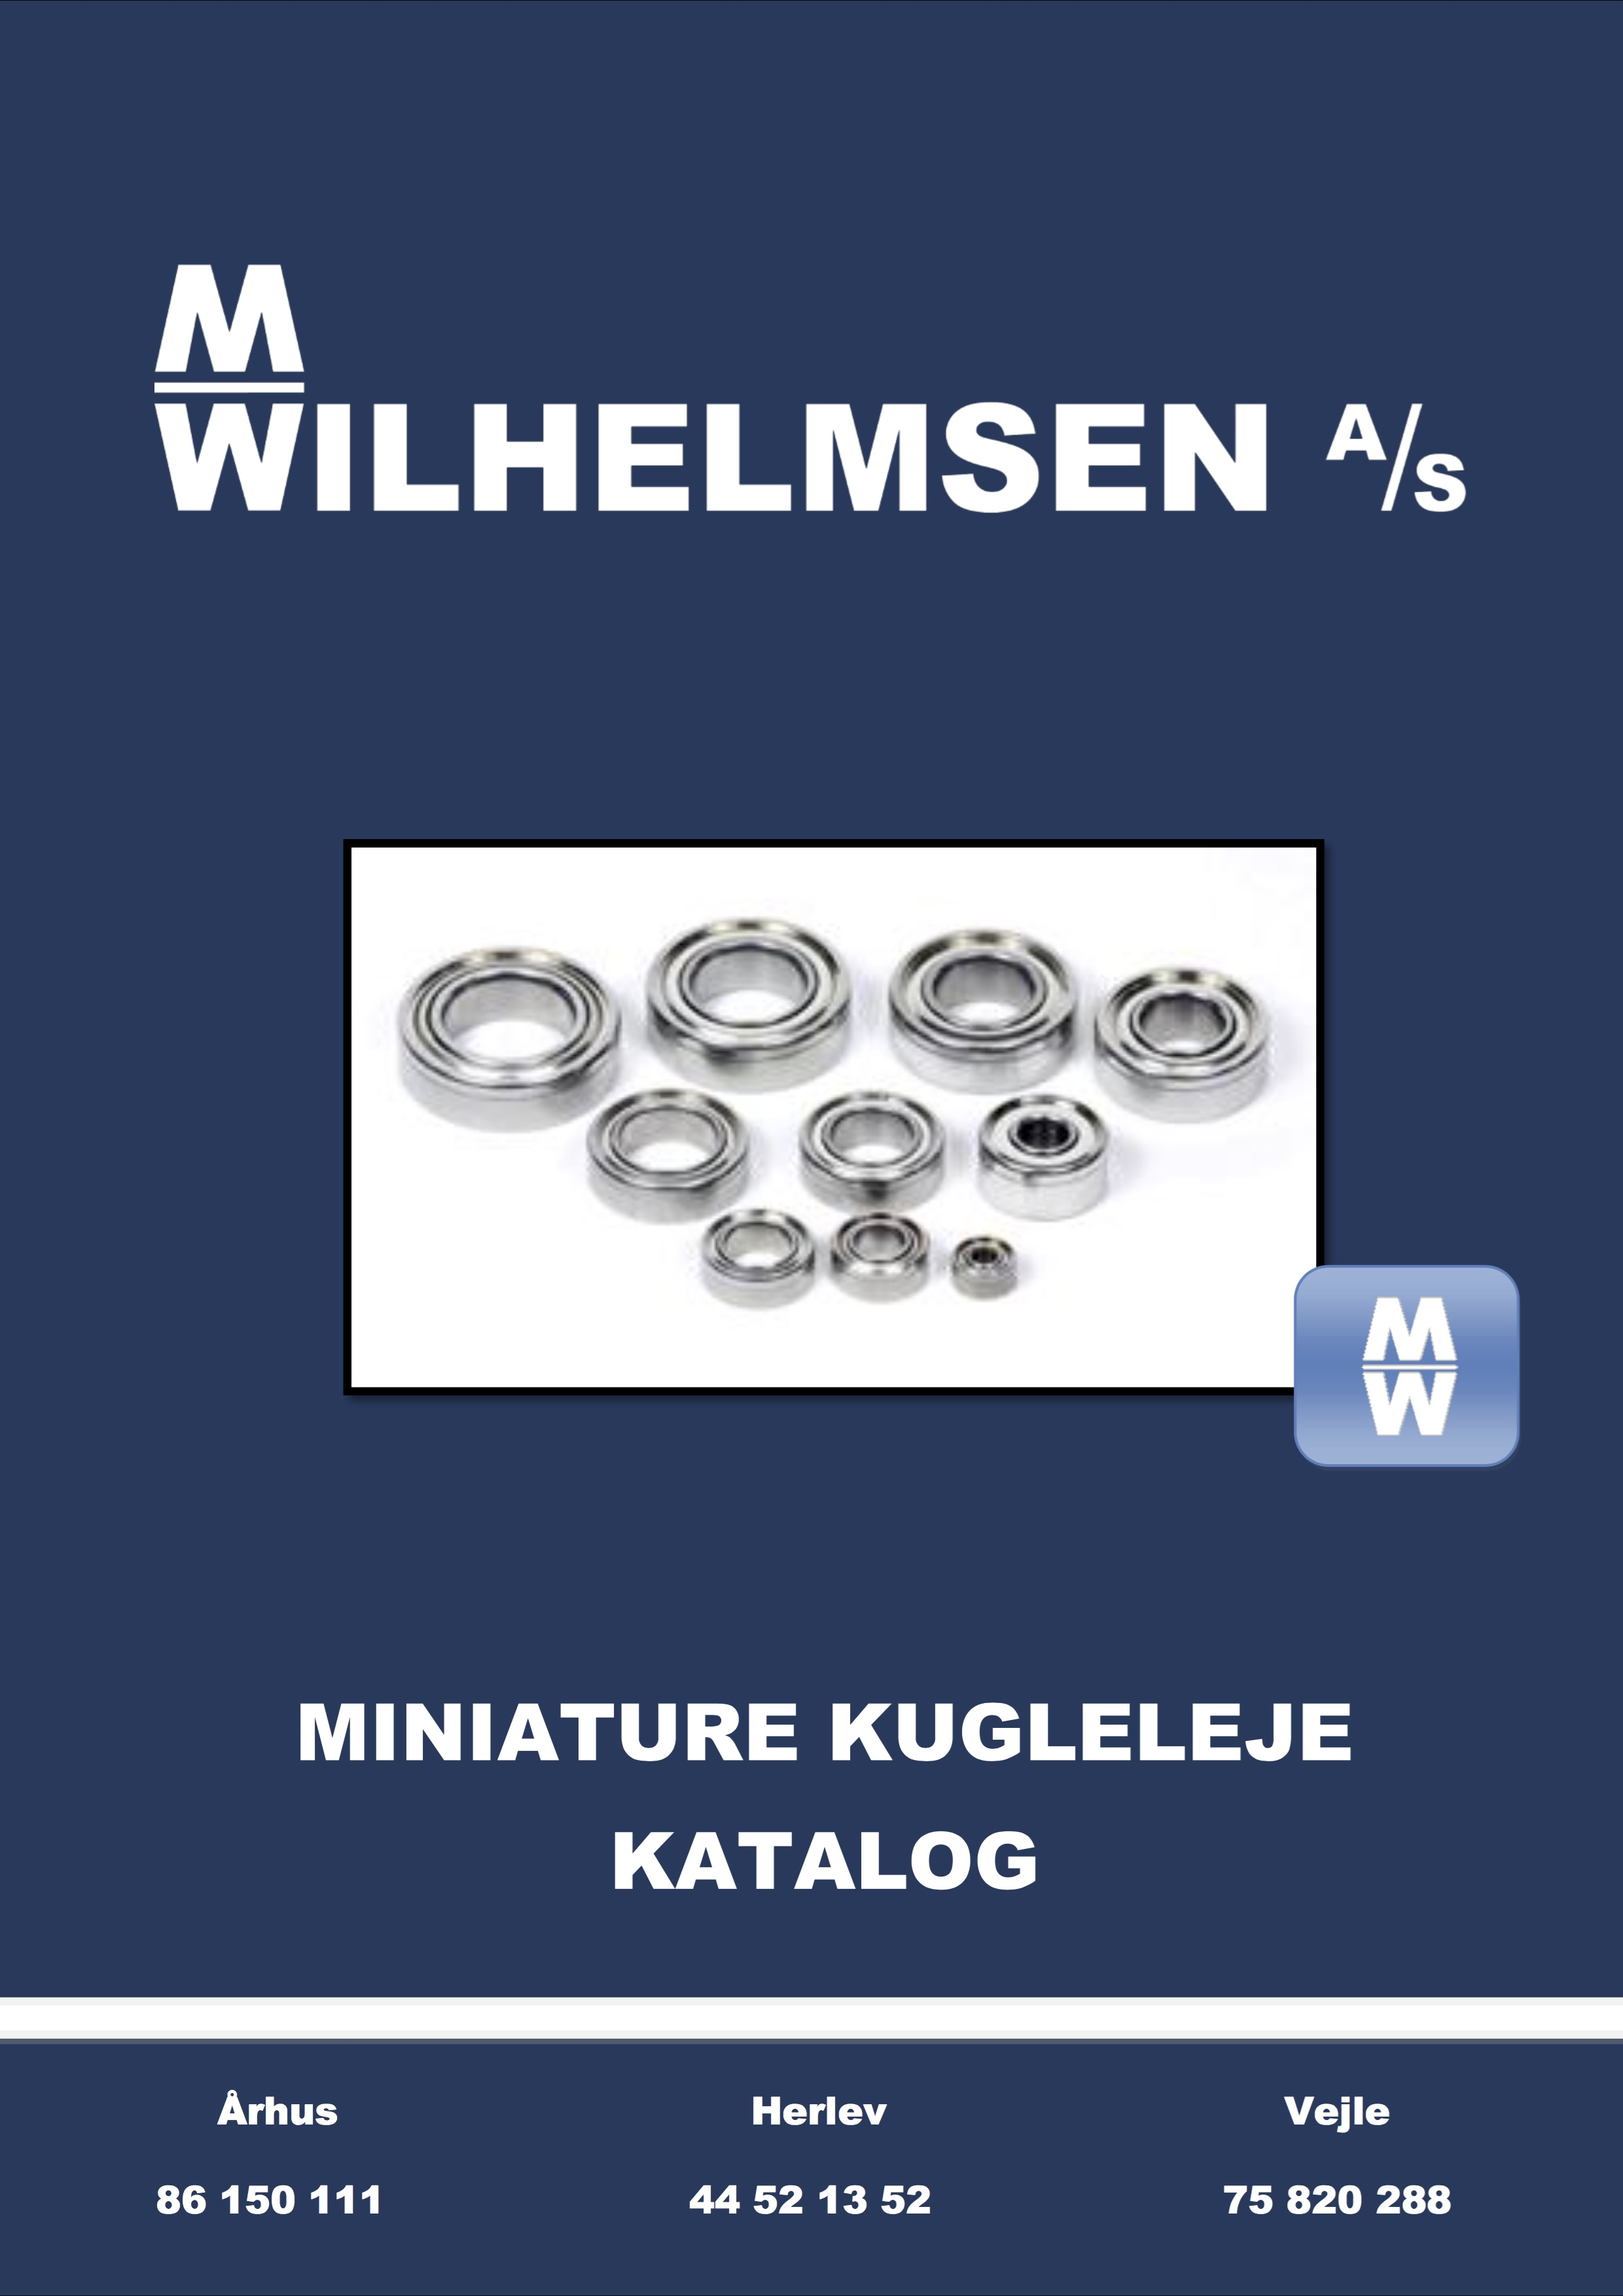 Miniature kugleleje katalog